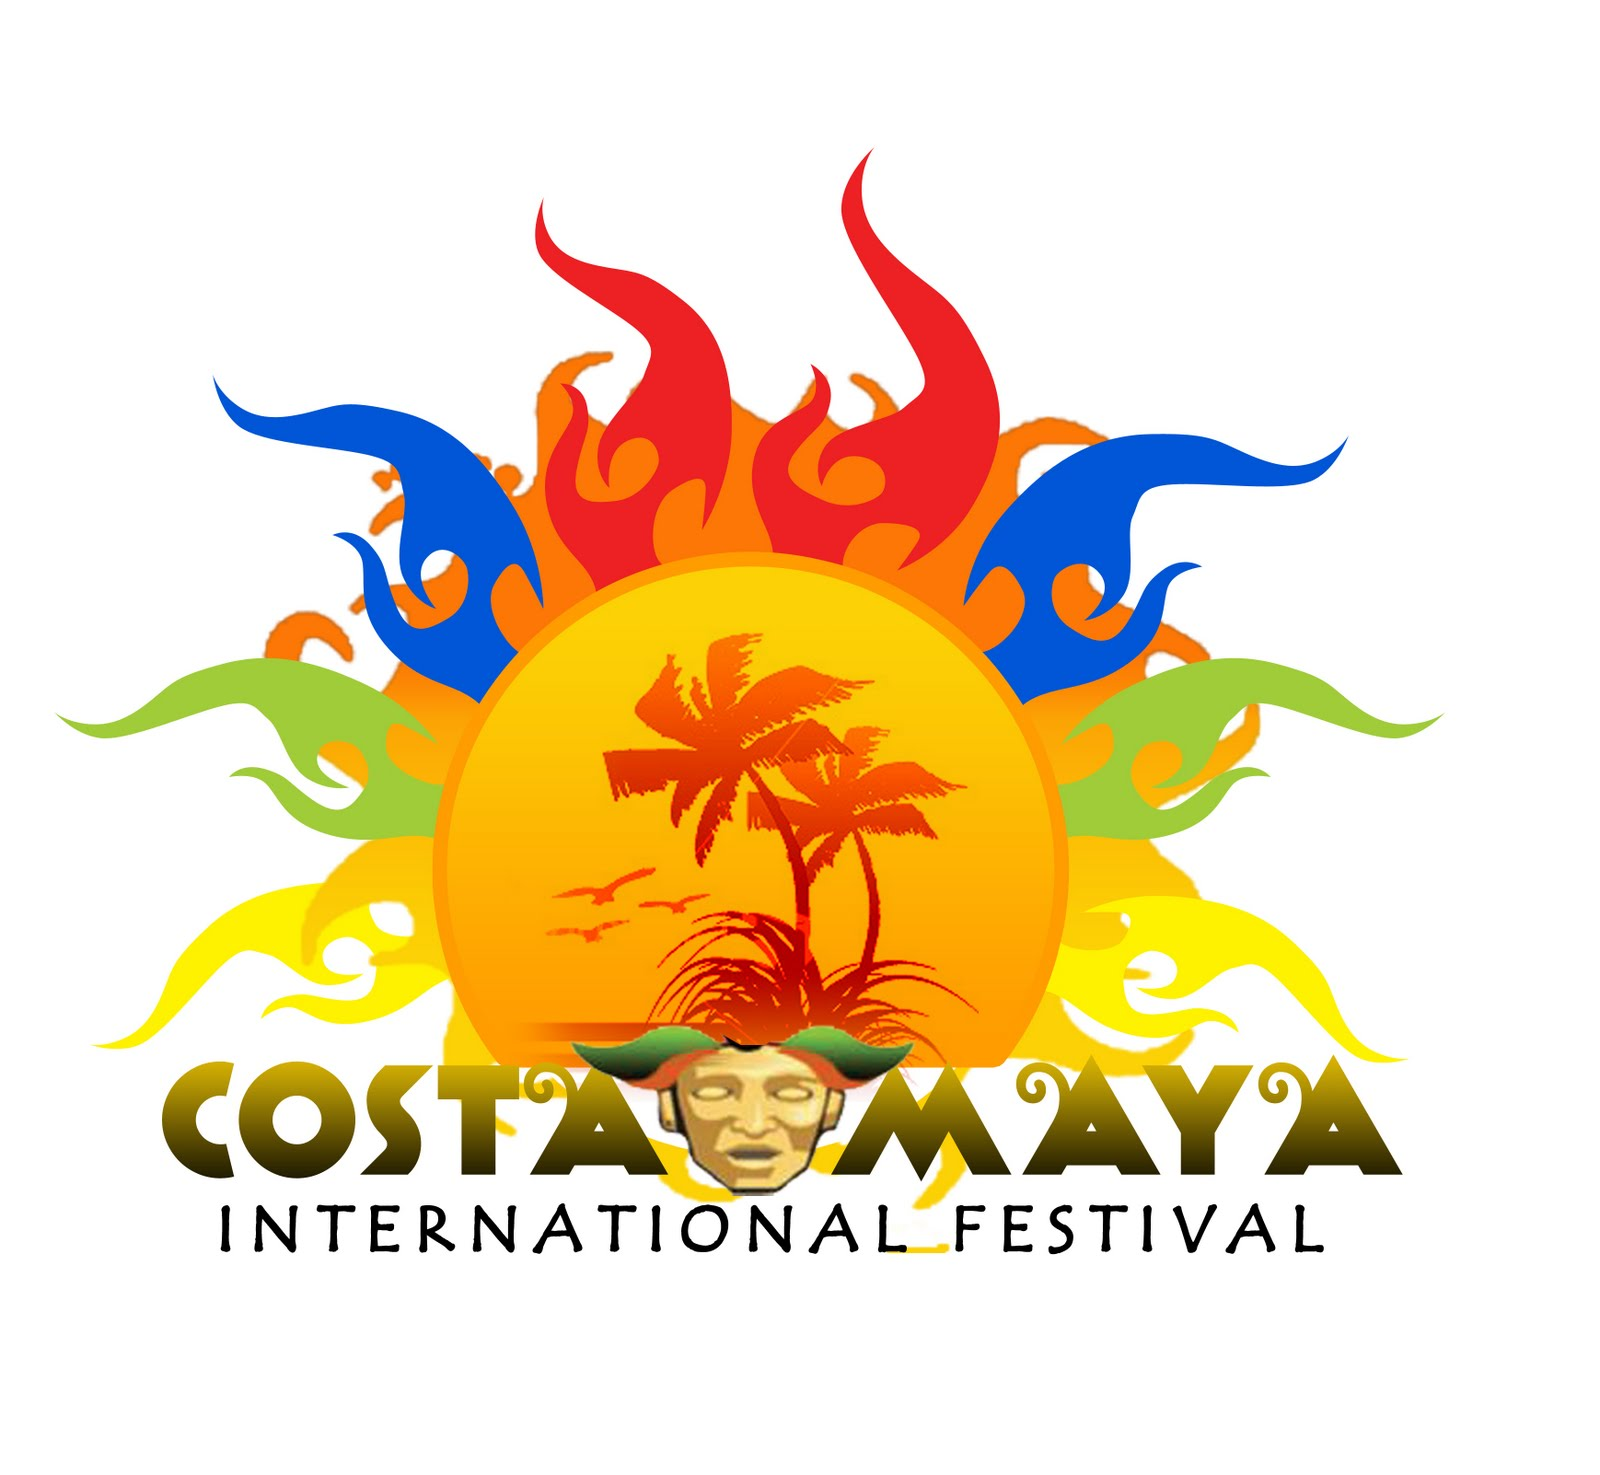 International Costa Maya Festival 2018